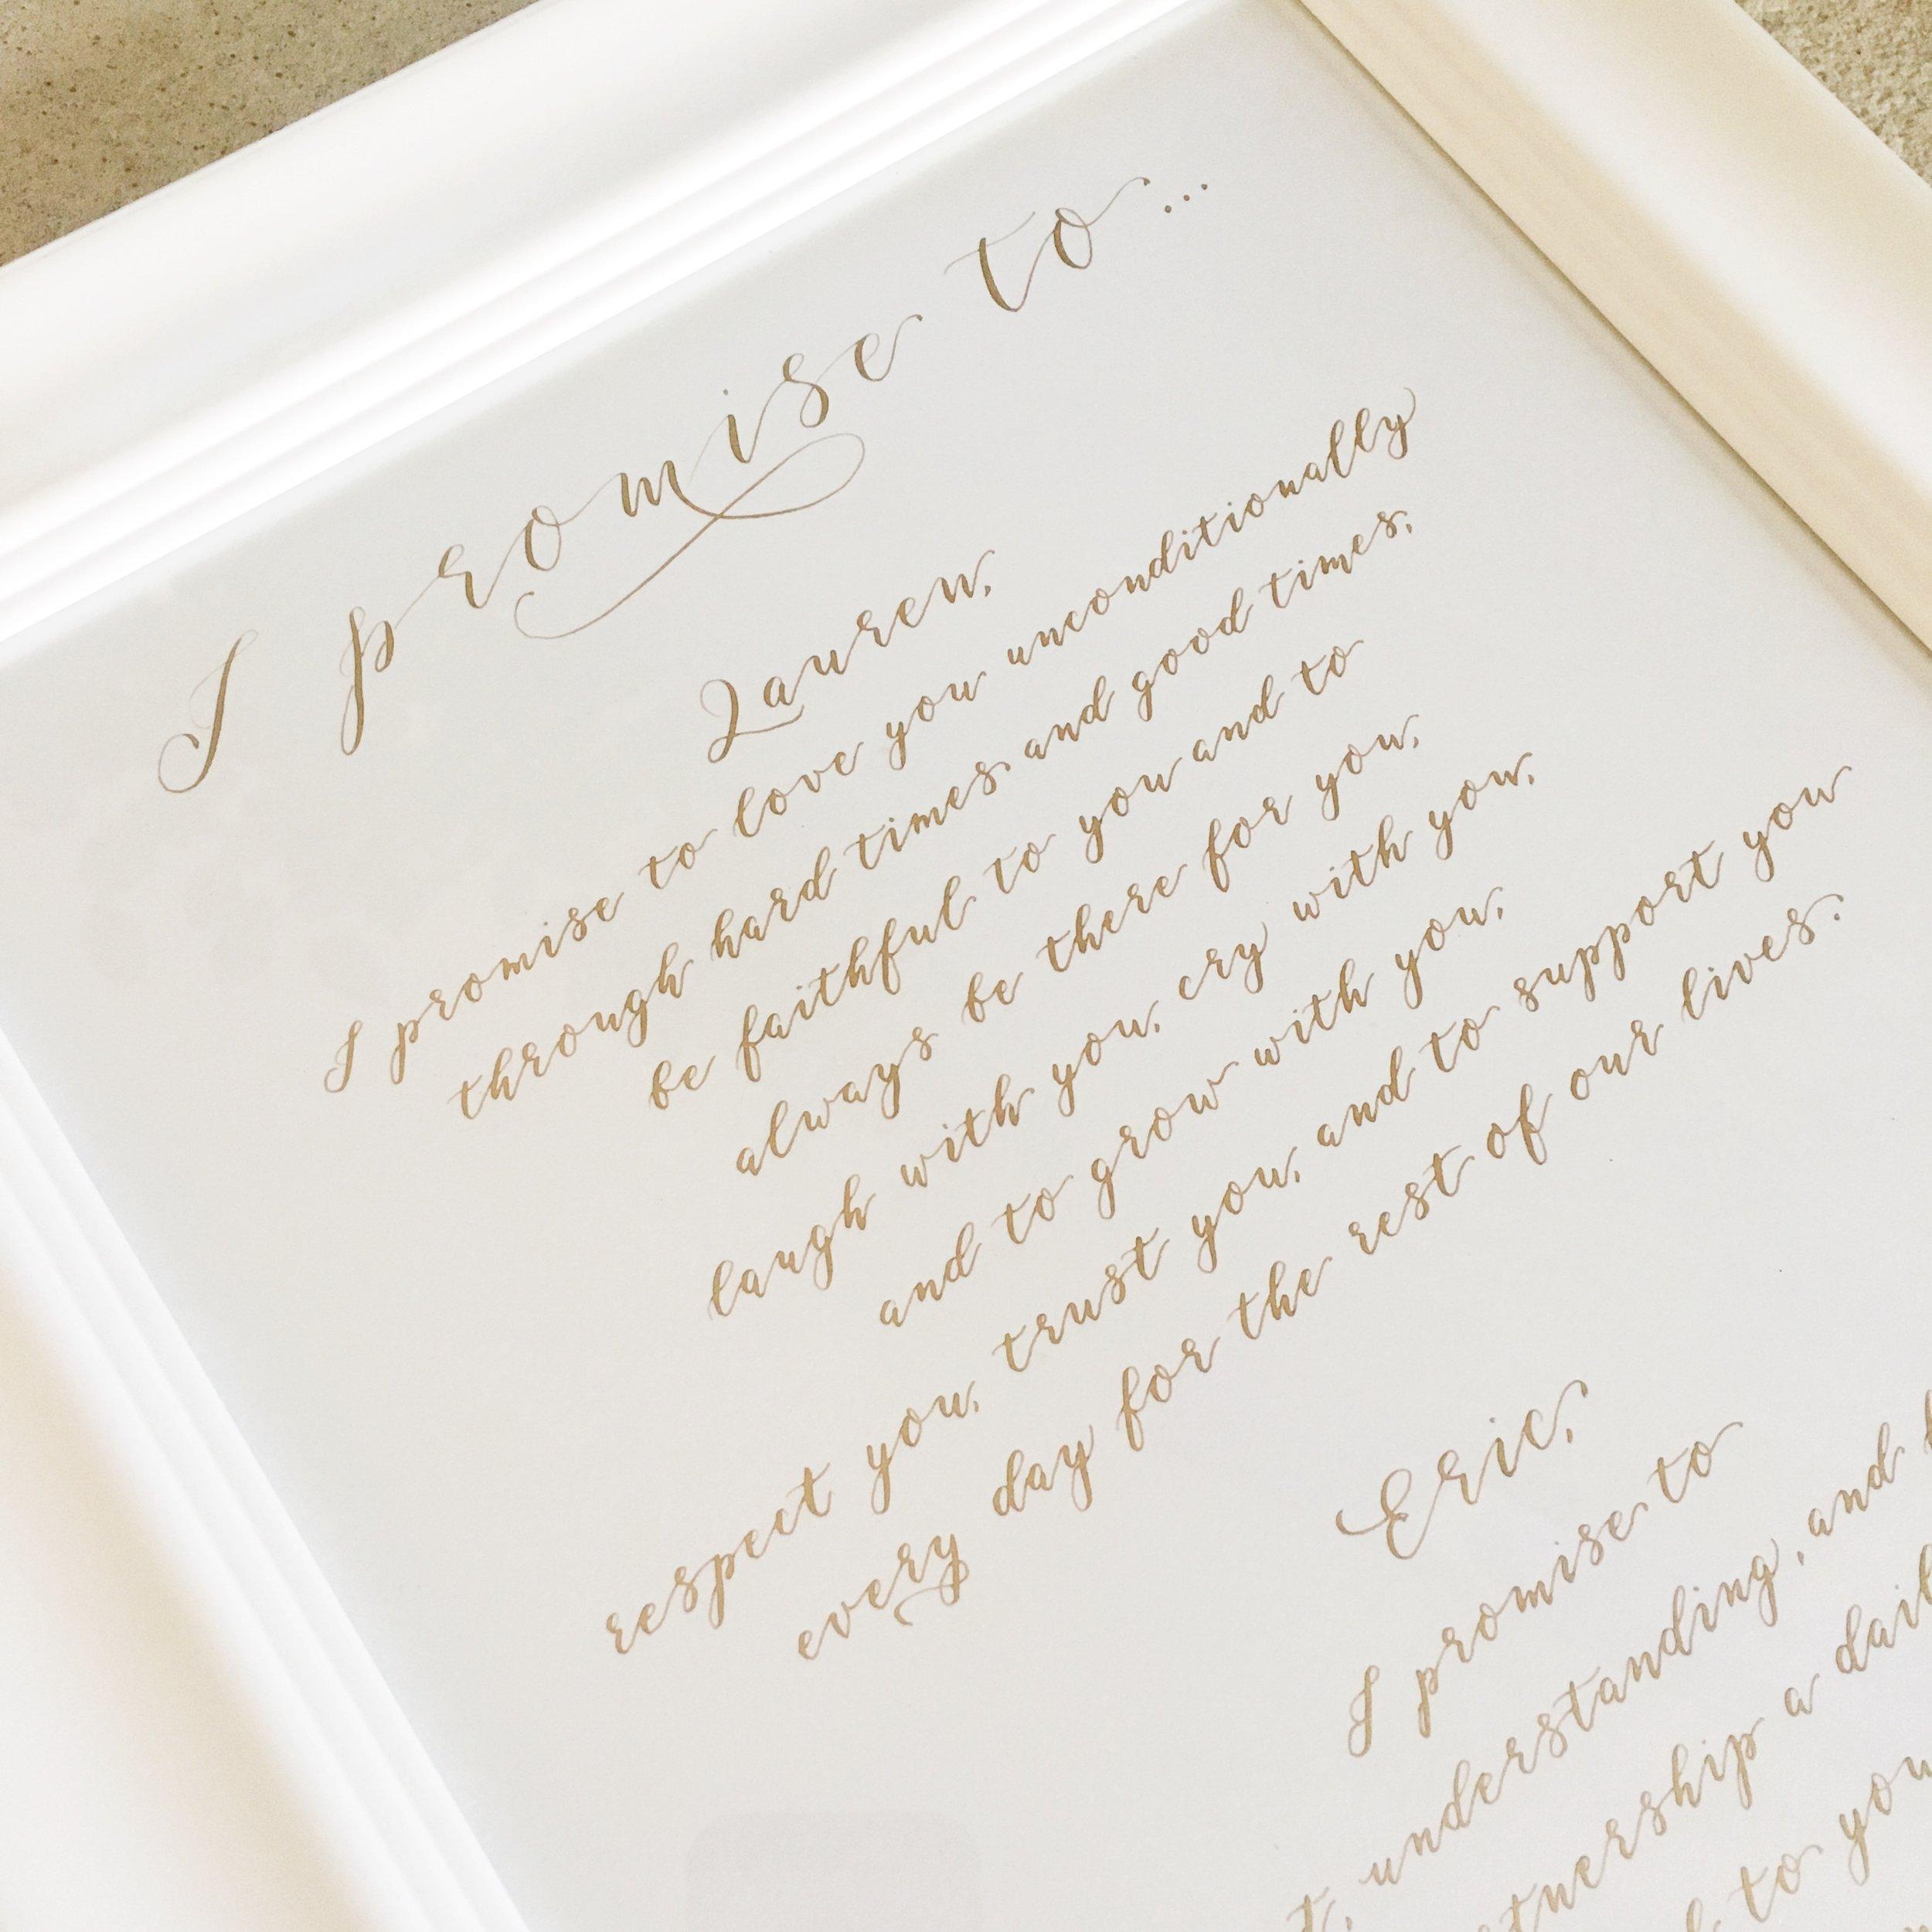 Central PA, York PA, JesSmith Designs, custom, wedding, invitations, bridal, announcements, save the date, birth, baby, motherhood, hanover, calligraphy, handlettering, wedding invitations, lancaster, gettysburg-07-18 19.40.19.jpg